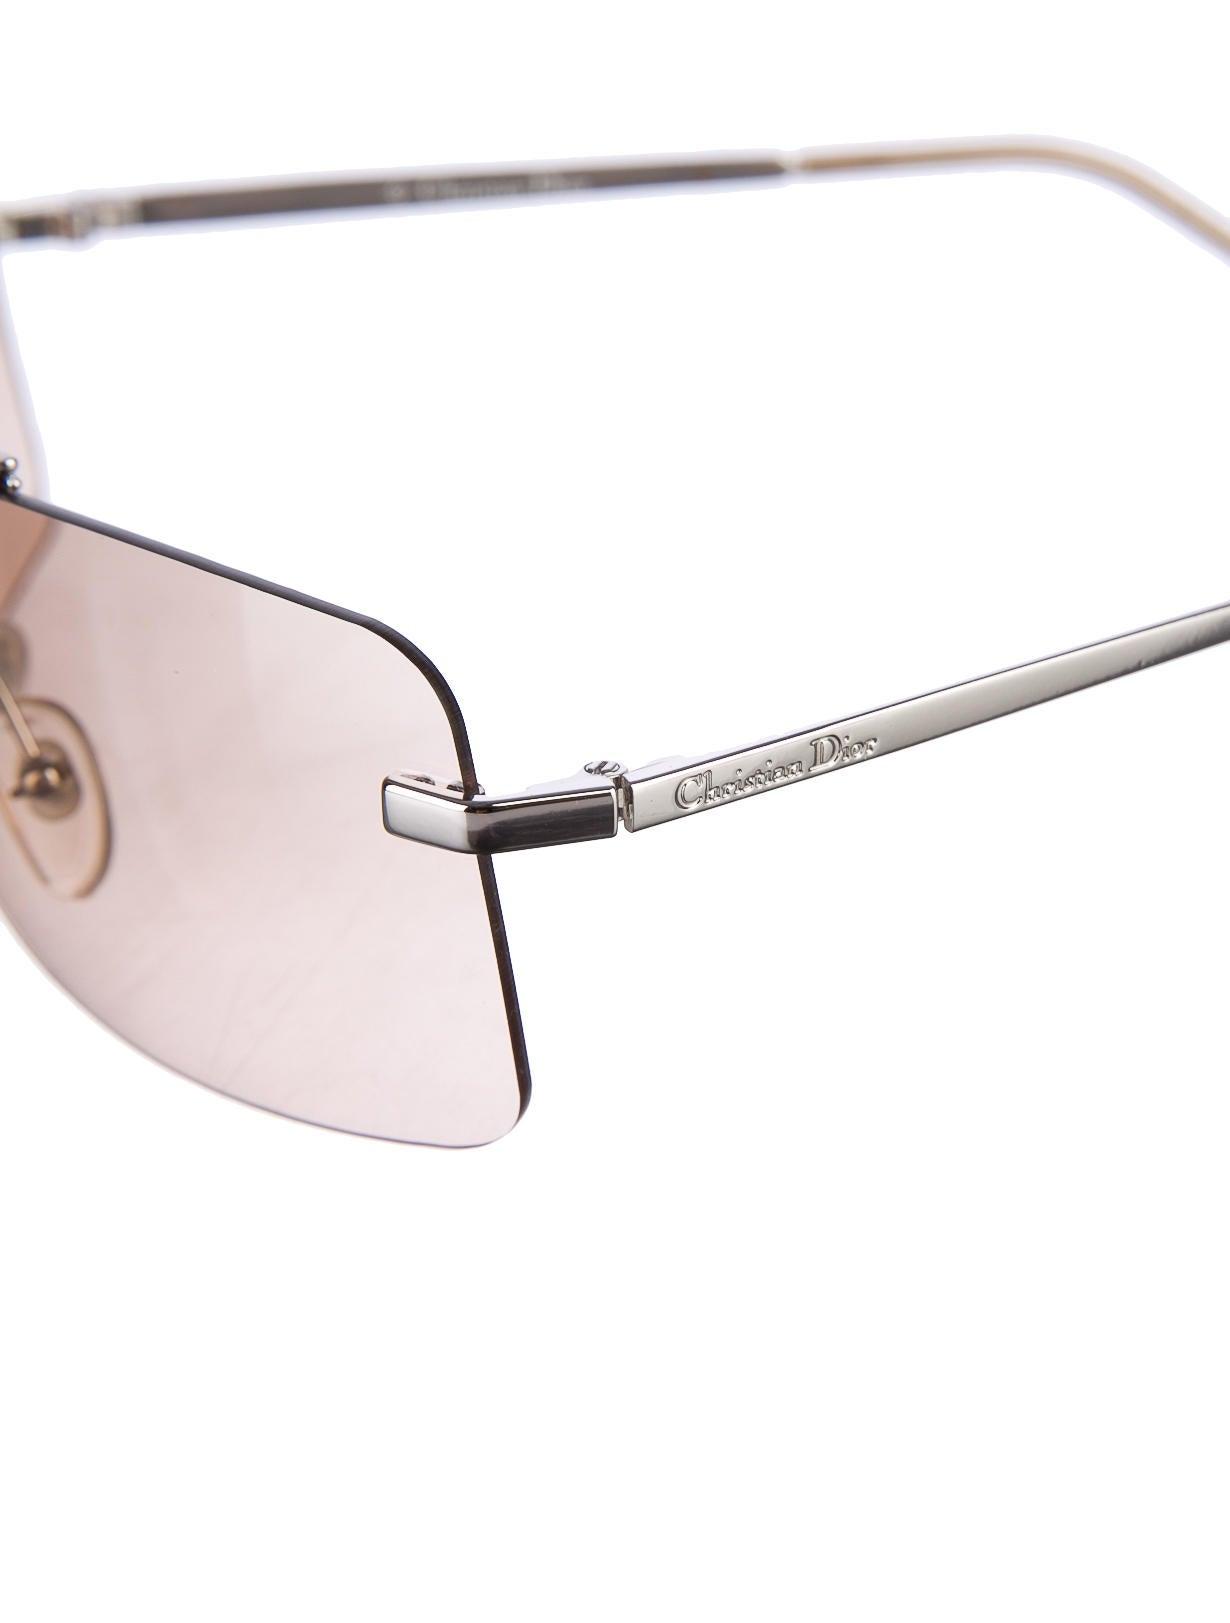 mini aviator sunglasses xwtd  Mini Motard Sunglasses